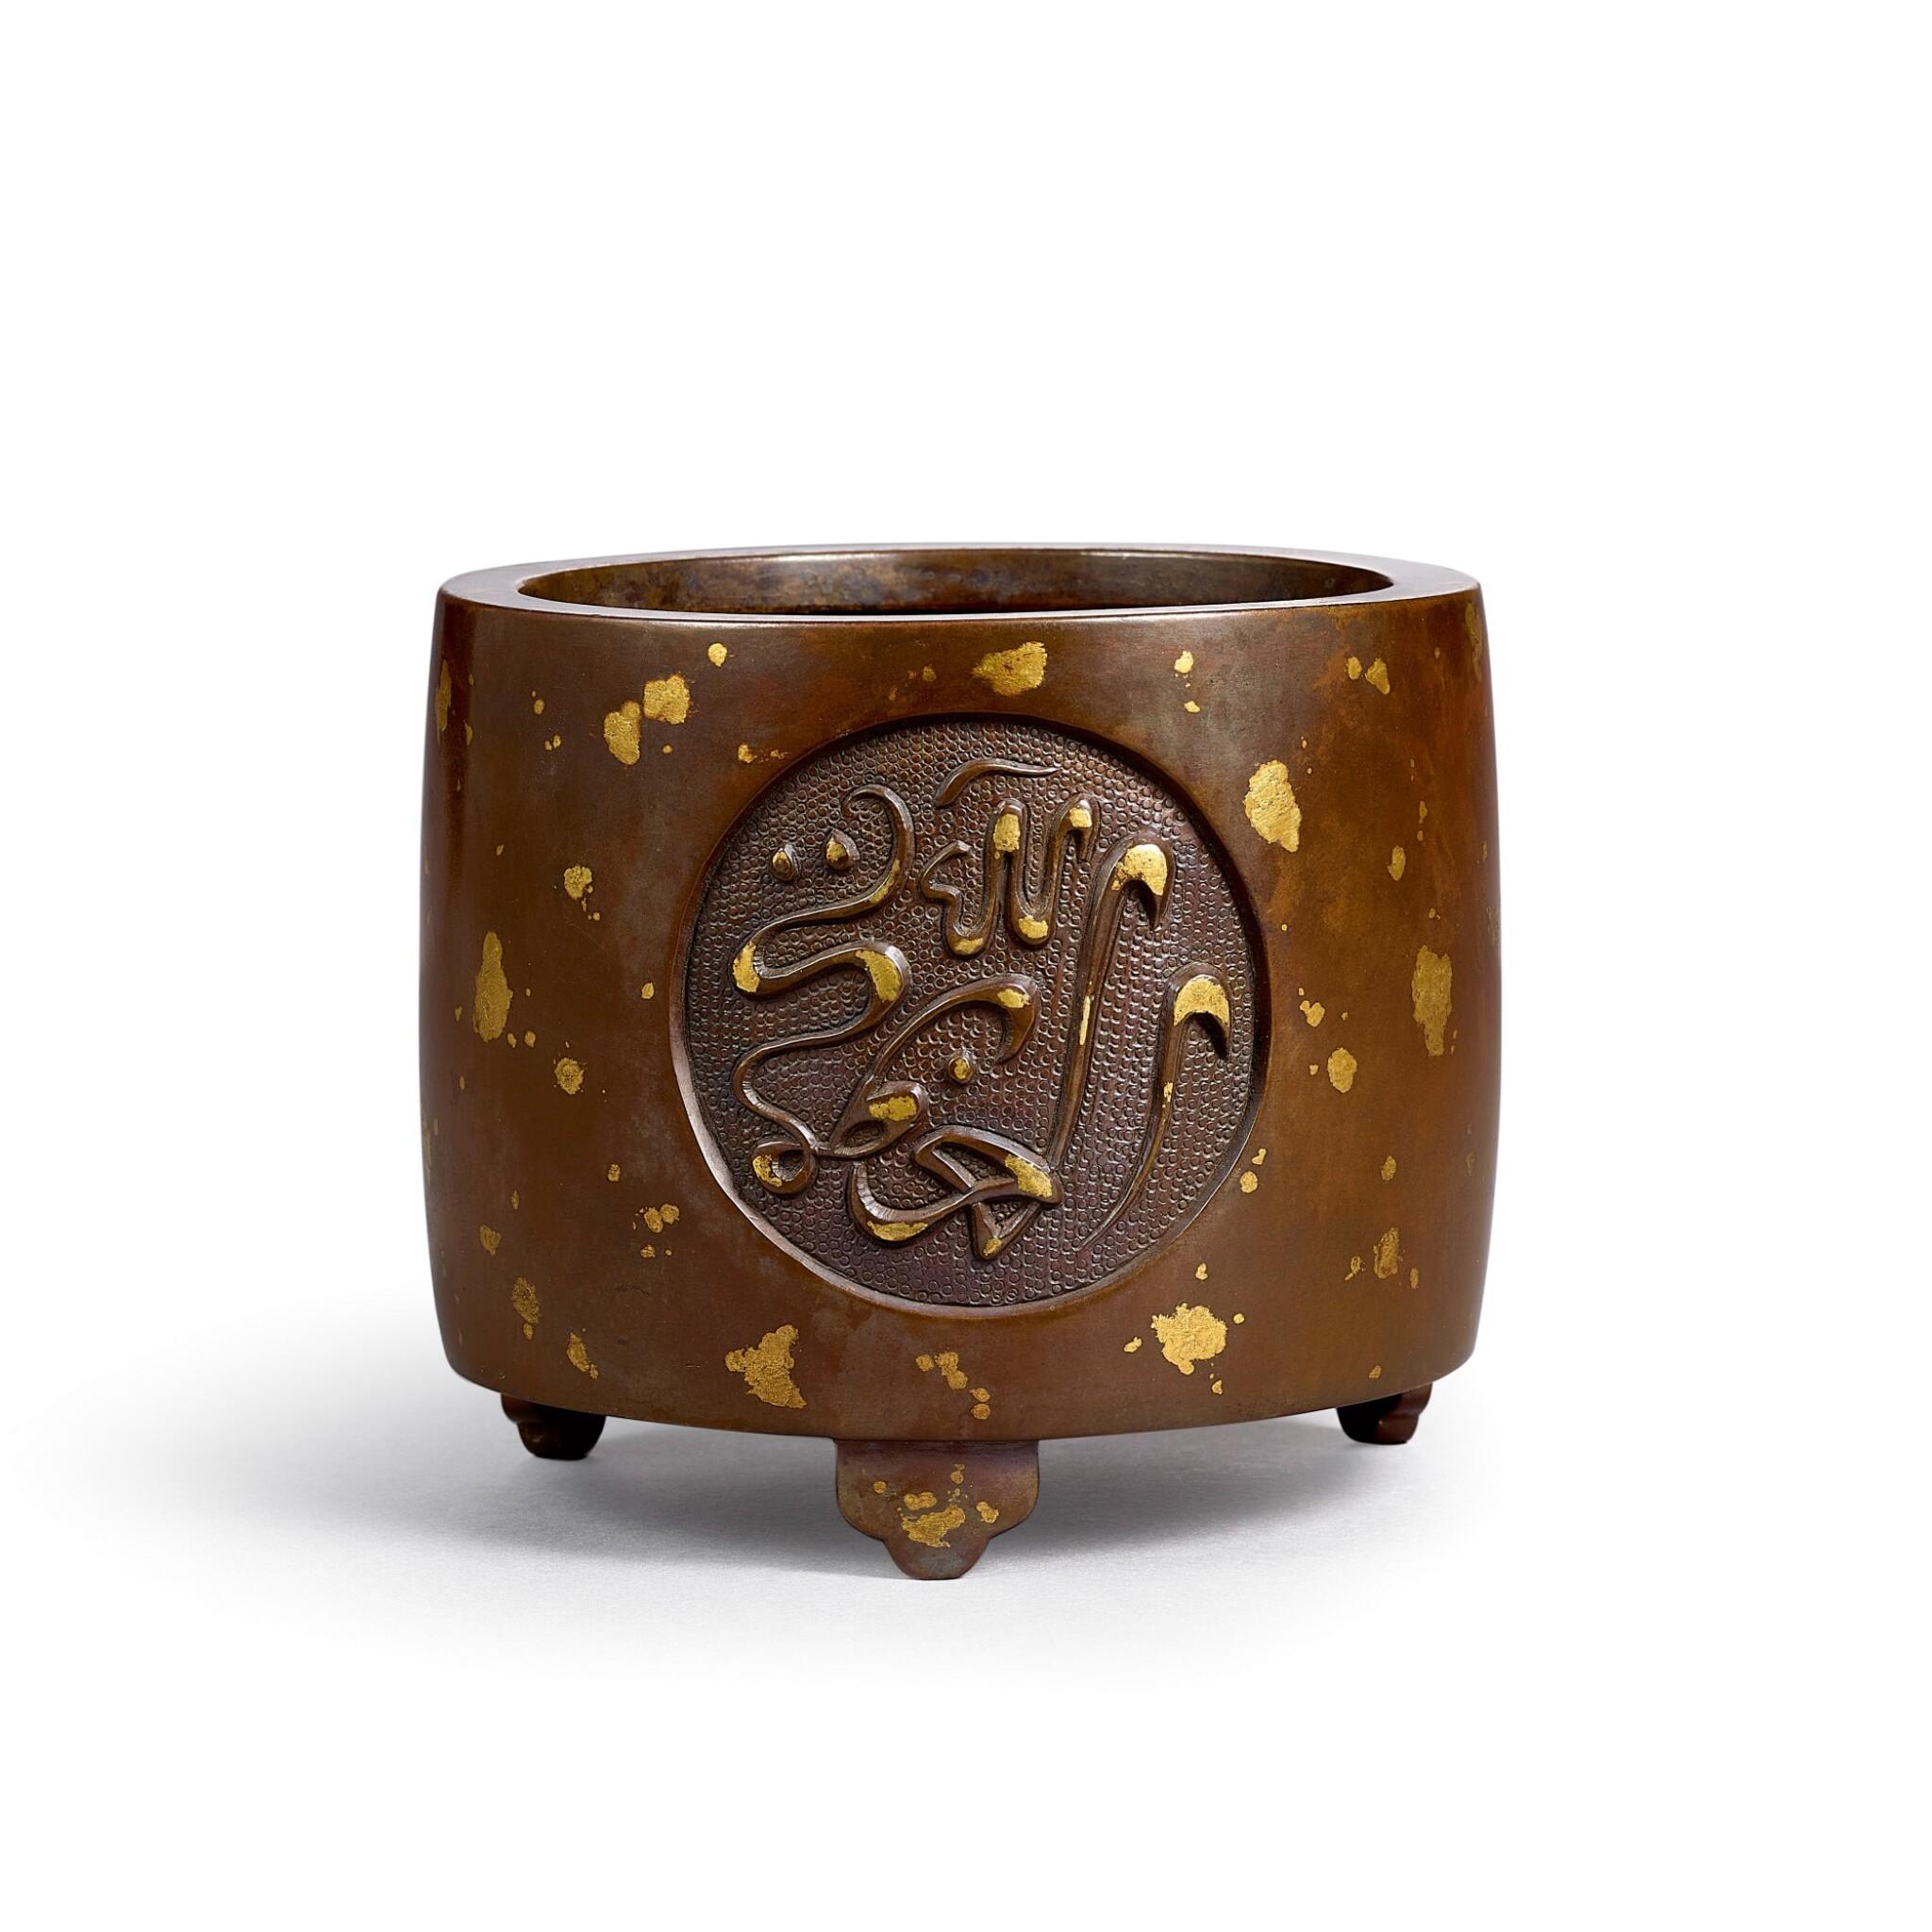 View full screen - View 1 of Lot 3678. An Arabic-inscribed gold-splashed tripod incense burner Late Ming Dynasty | 明末 灑金銅阿拉伯文筒式爐 《飛雲閣》款.